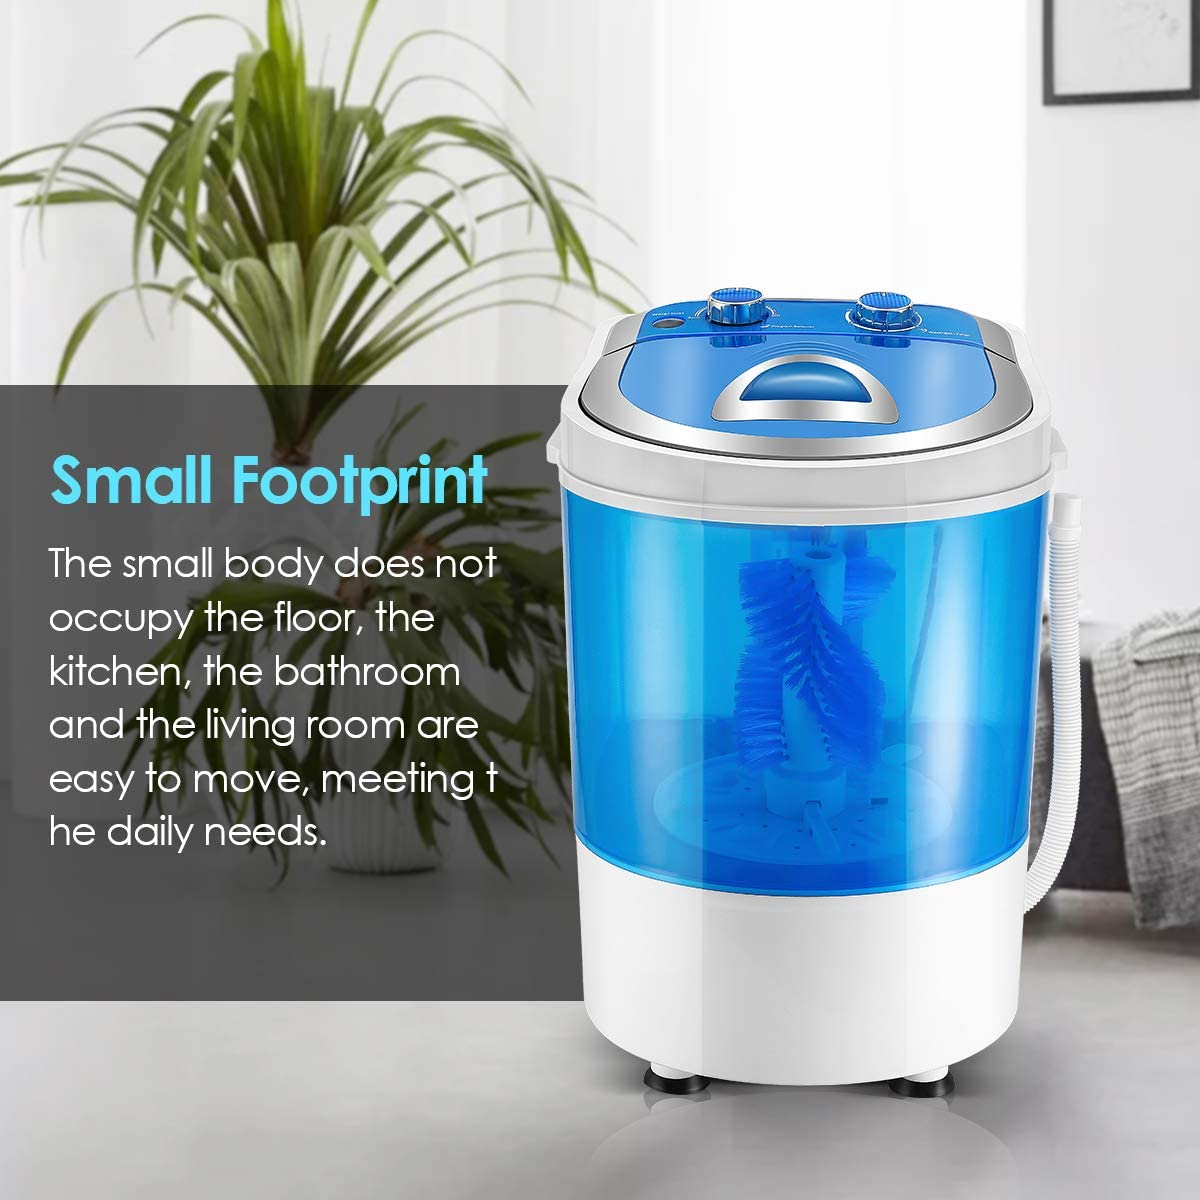 S SMAUTOP Portable Mini Shoes/washing machine Smart Lazy/Automatic Shoes Washer Artifact Deodorant Shoes Washing Machine/